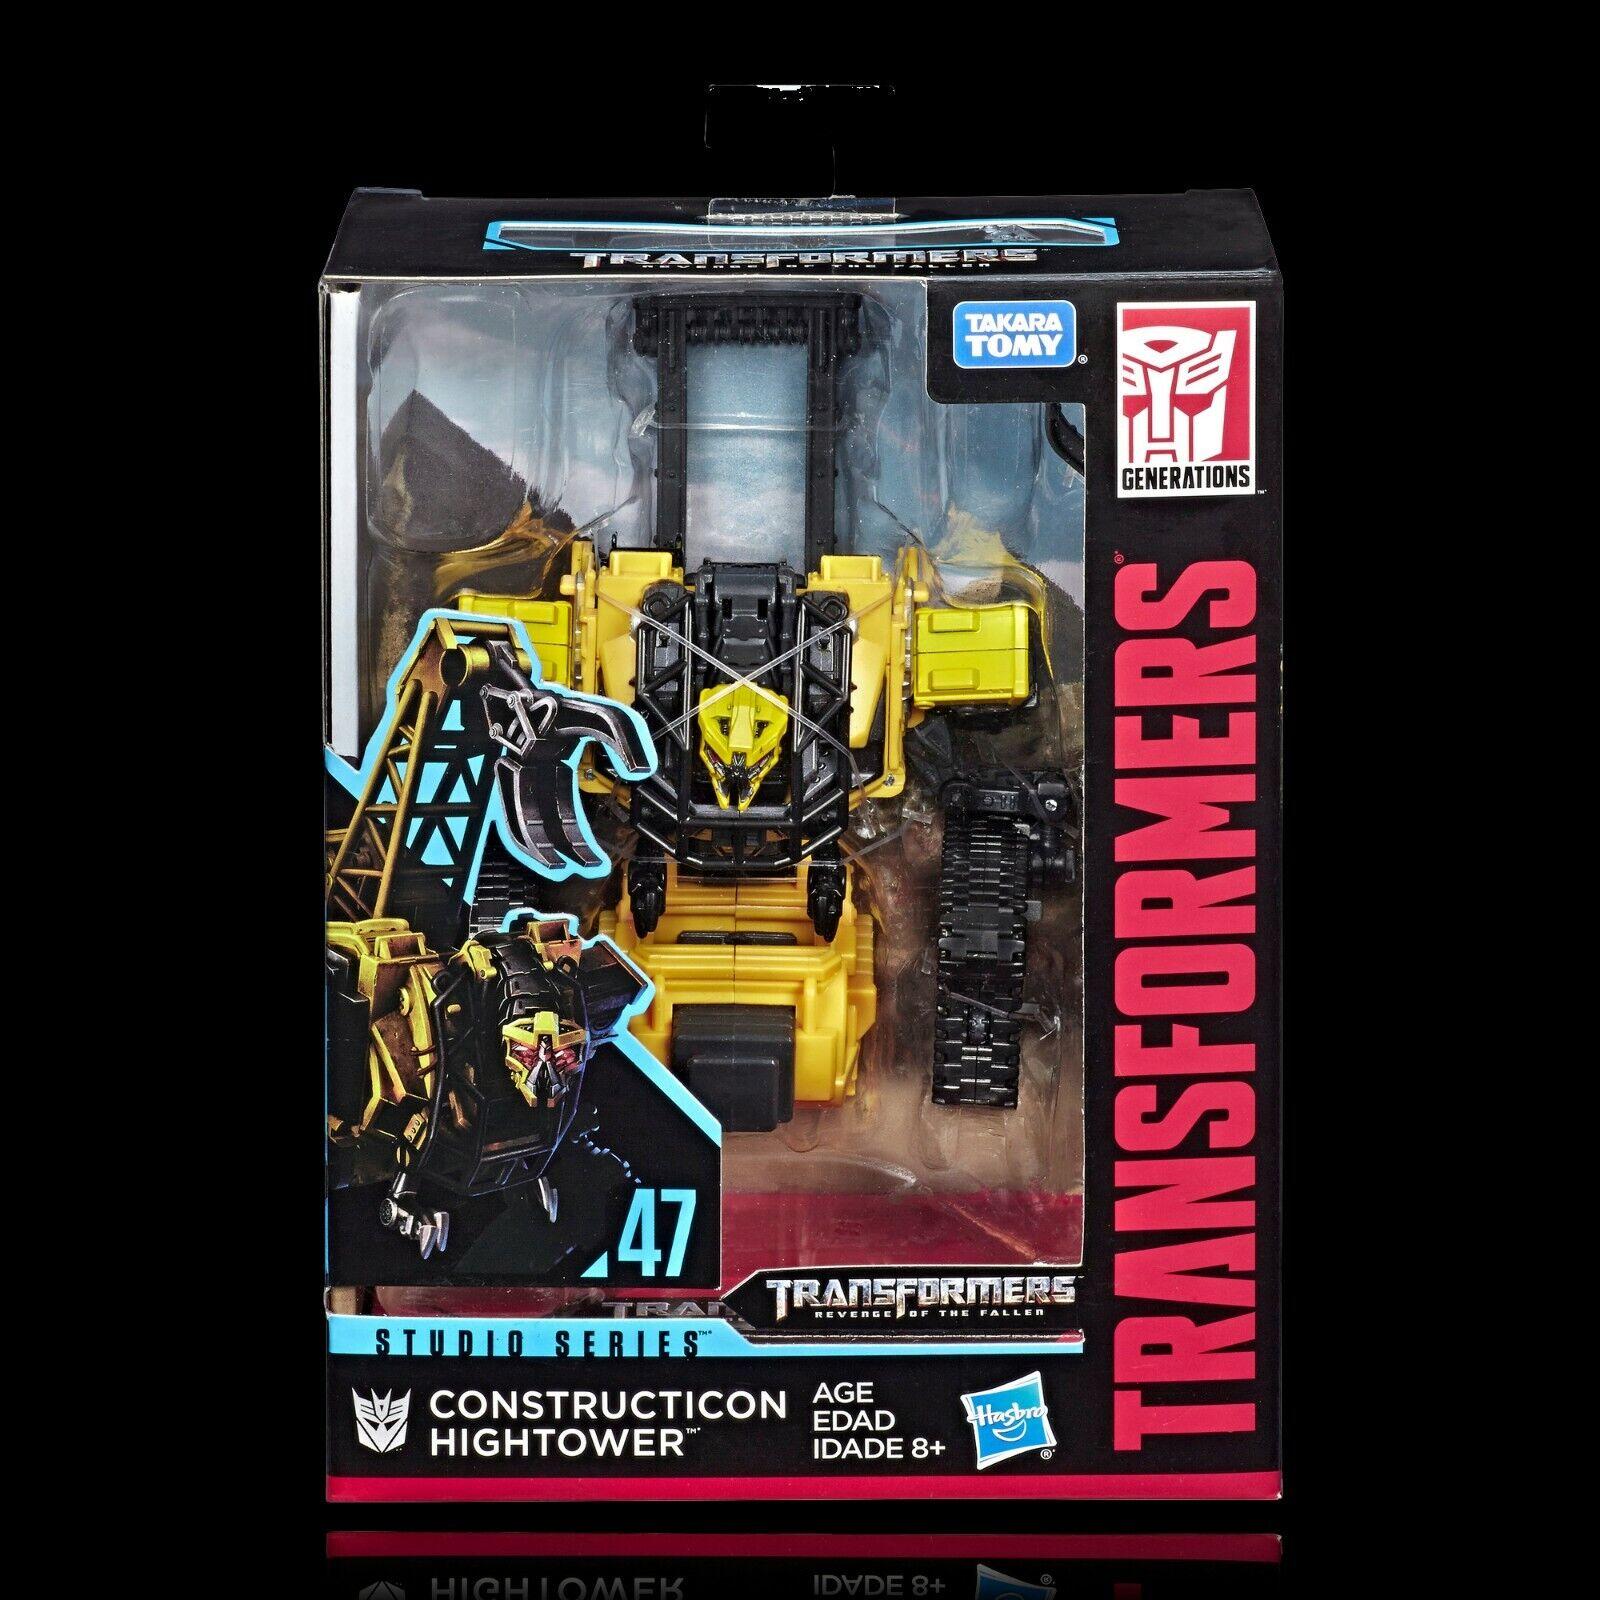 Transformers Hasbro Studio Series SS47 Deluxe Hightower NUOVO IN SCATOLA SIGILLATA